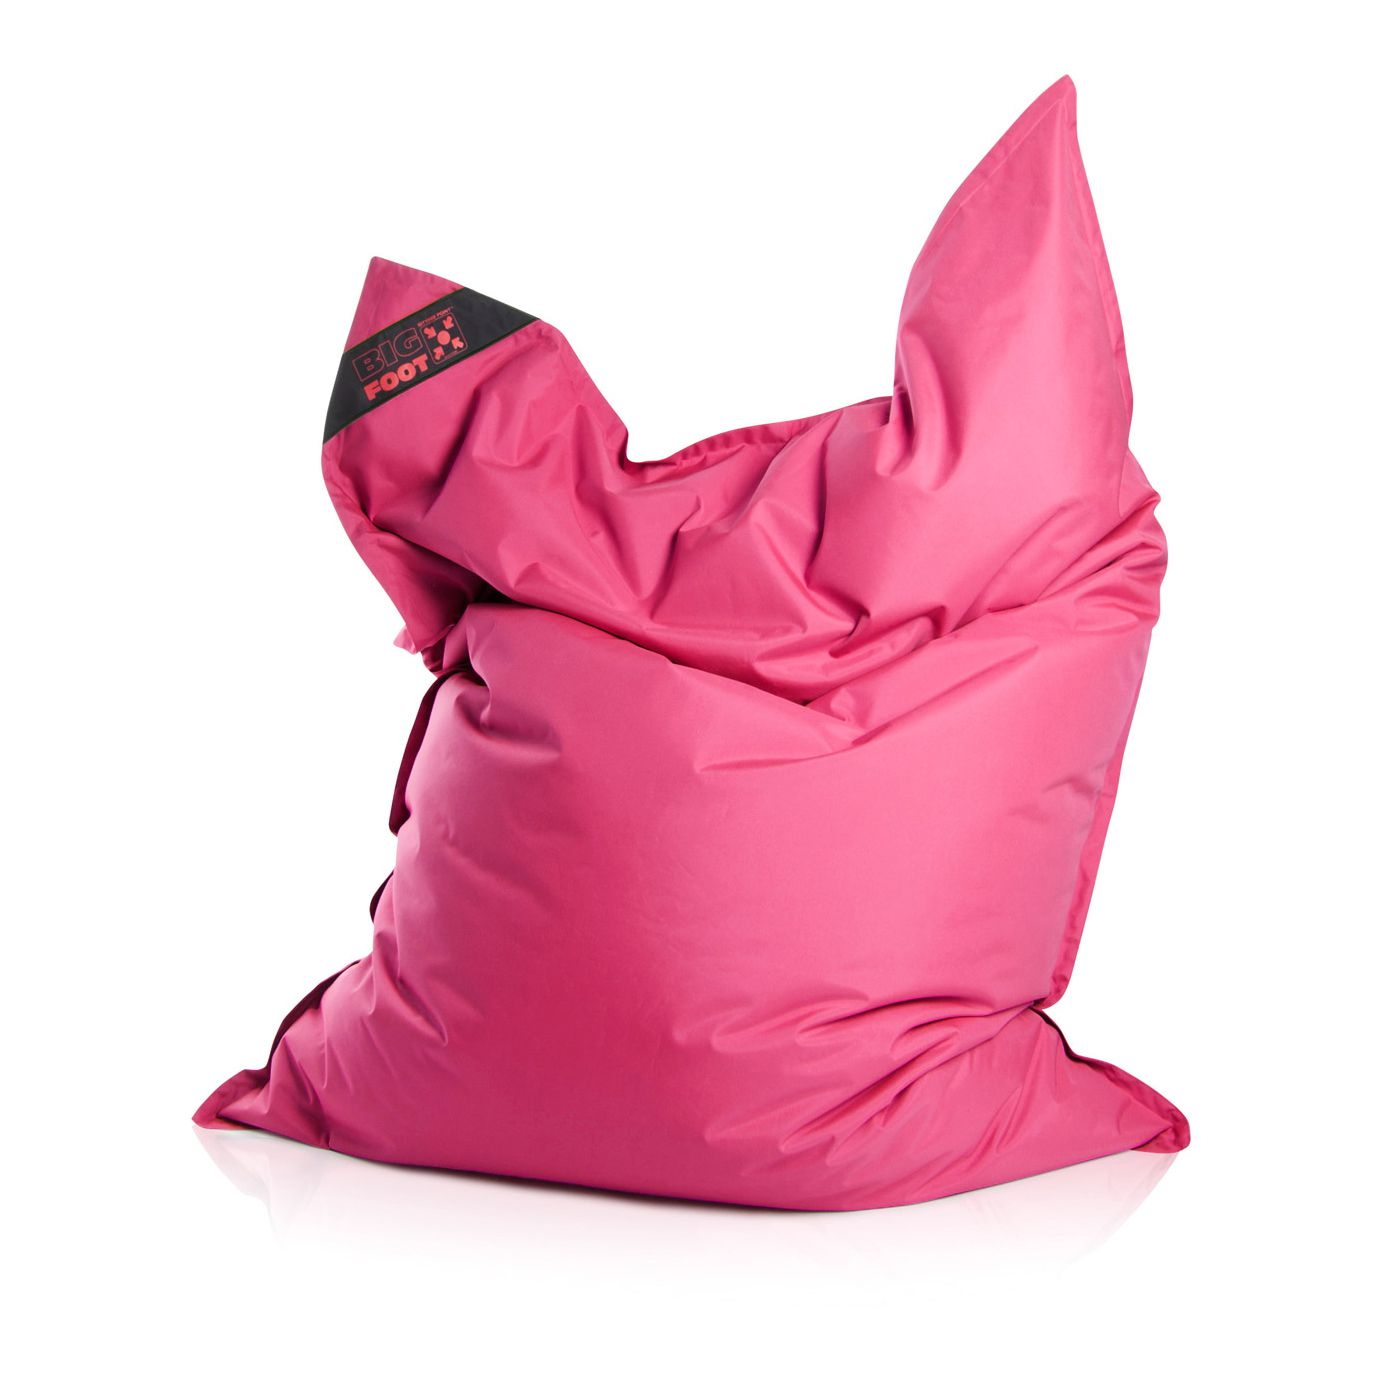 Sitzsack Big Foot – Pink, Fredriks jetzt kaufen